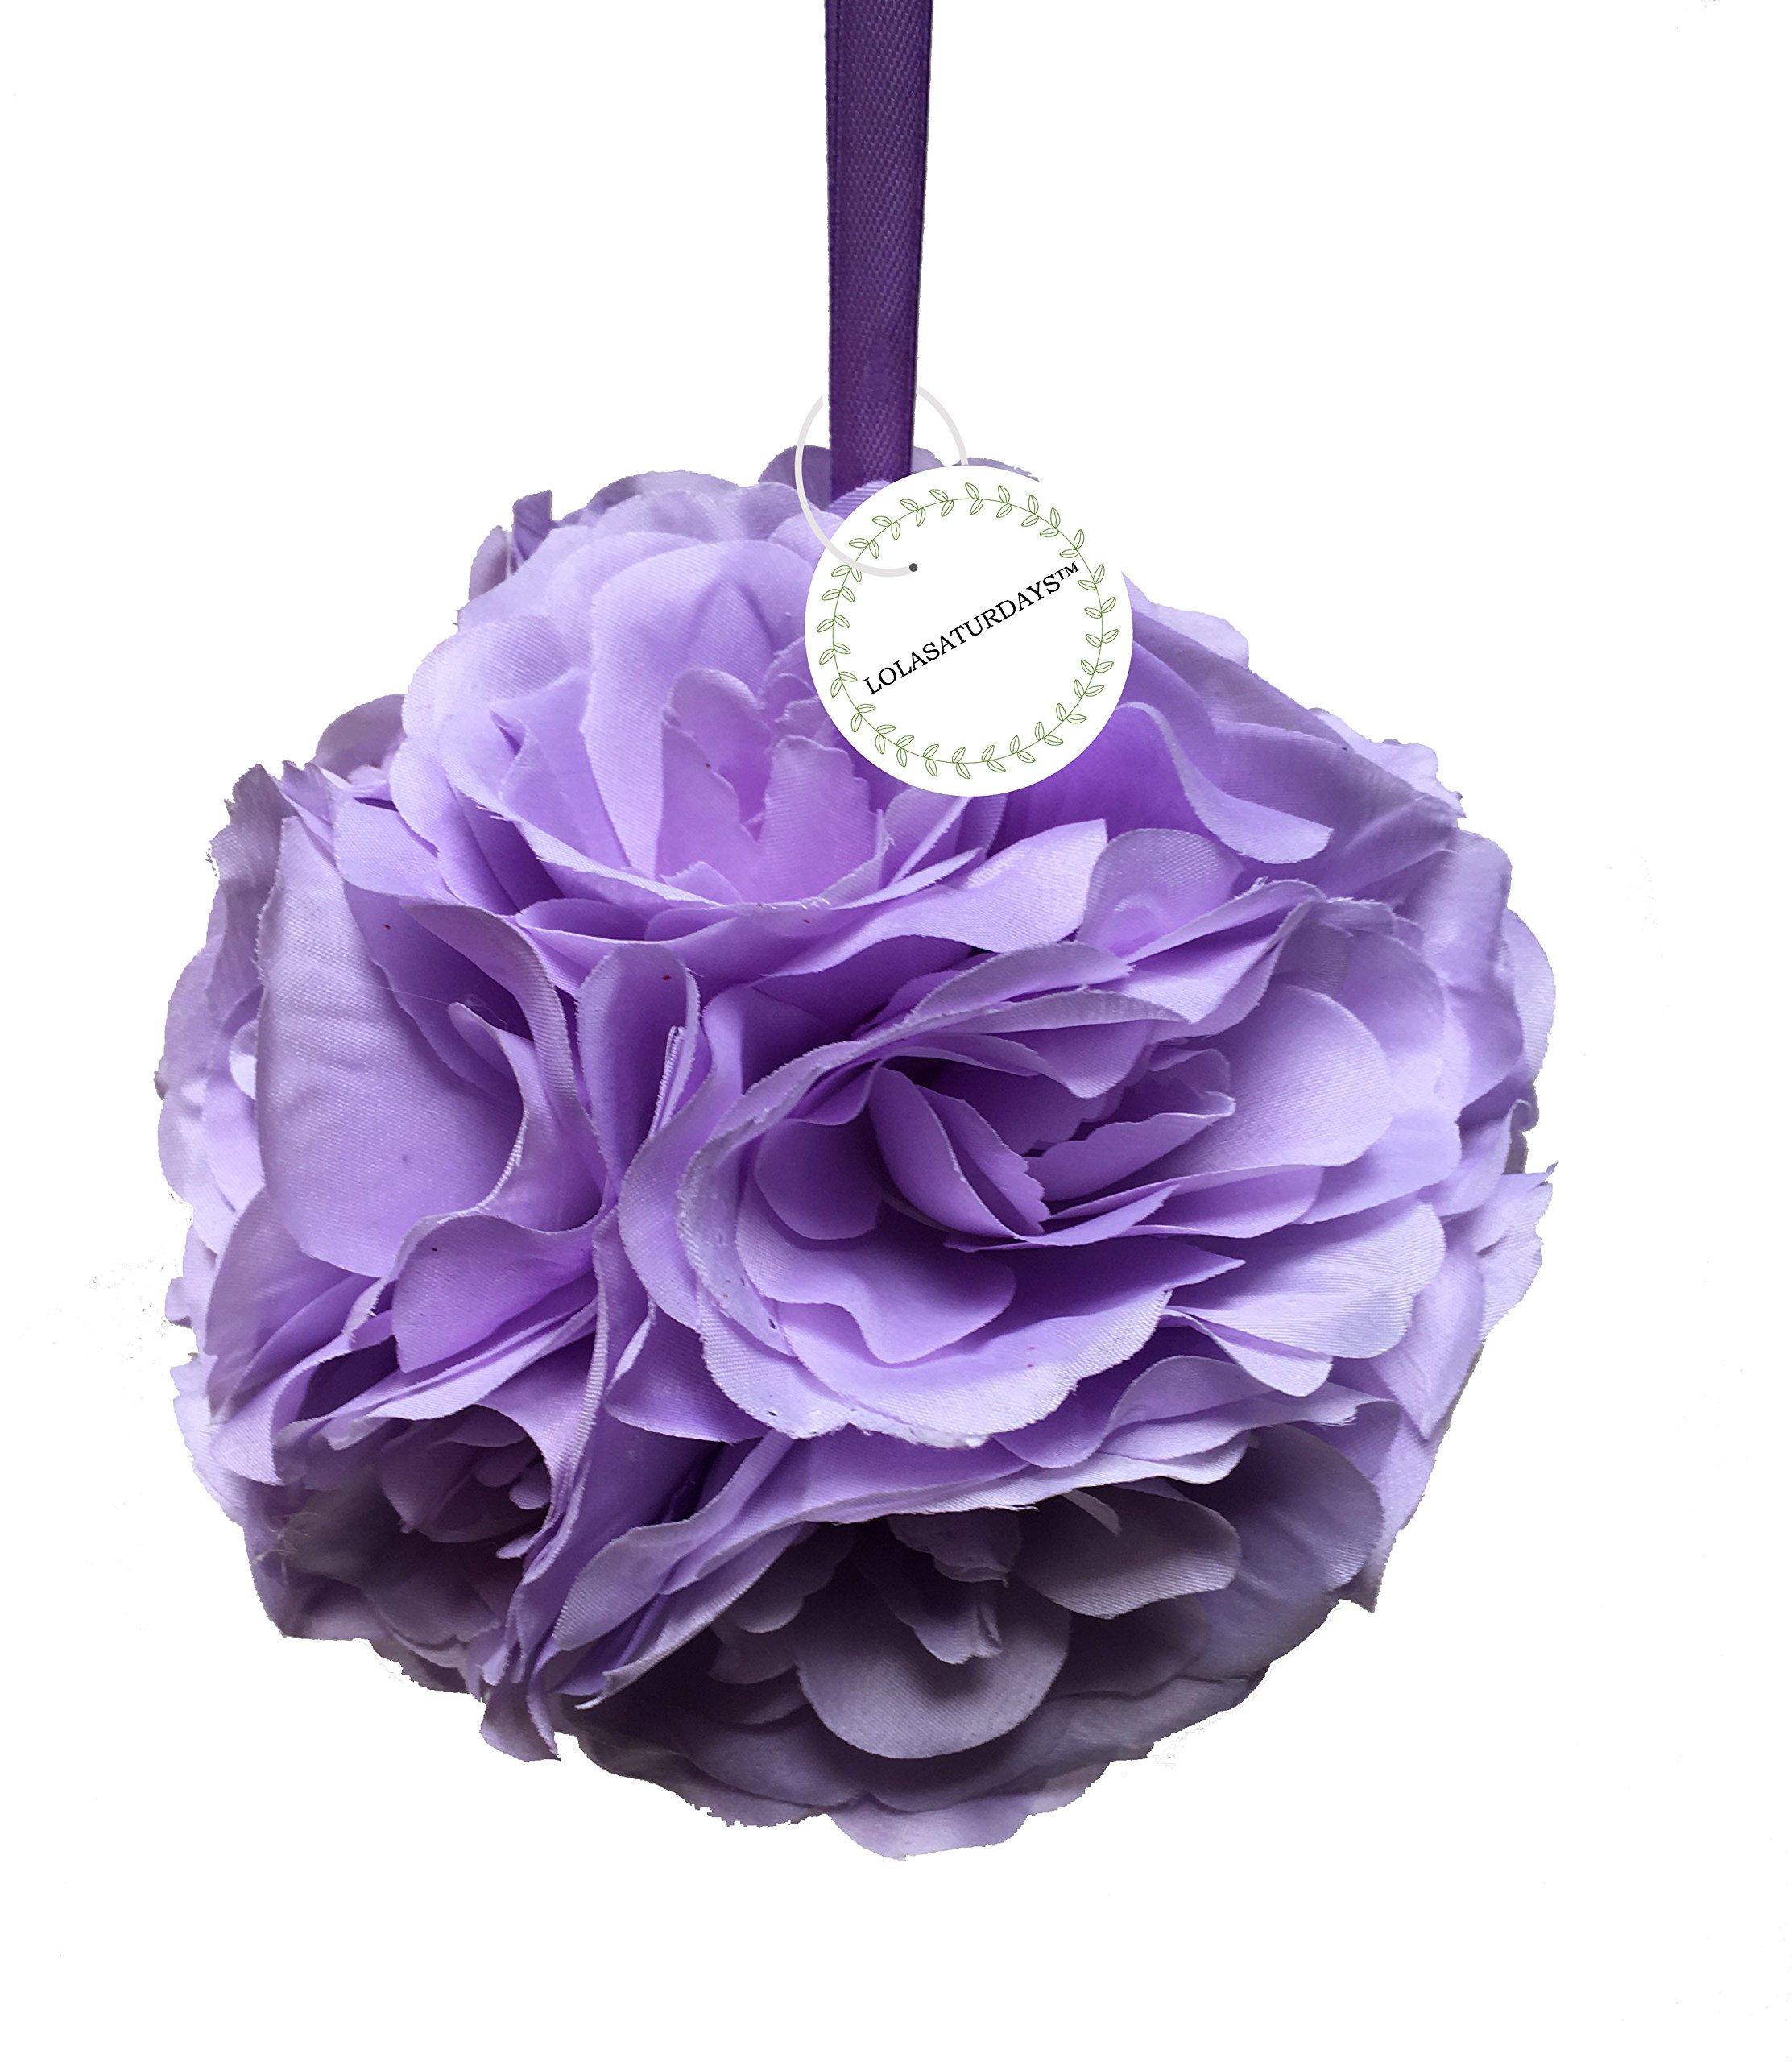 LOLASATURDAYS-Flower-Kissing-Balls